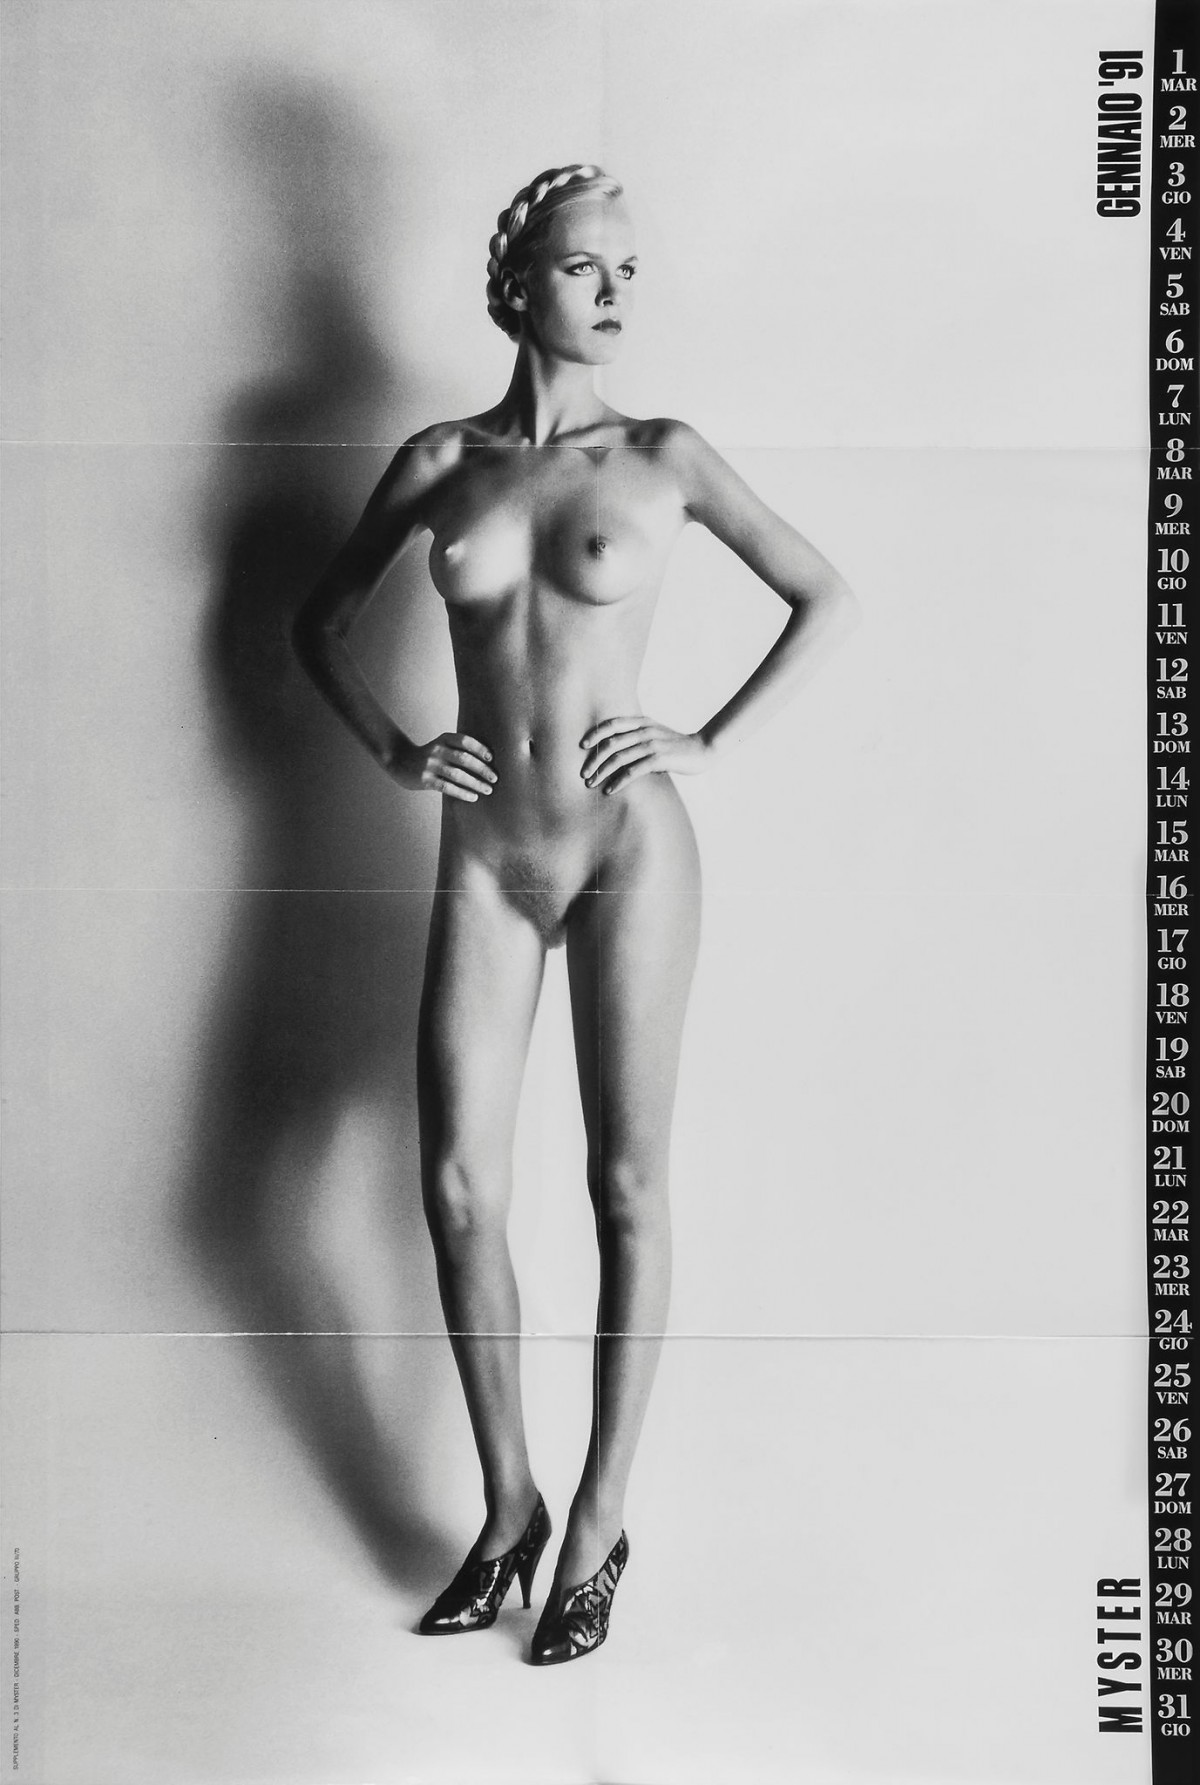 The original shot by Helmut Newton